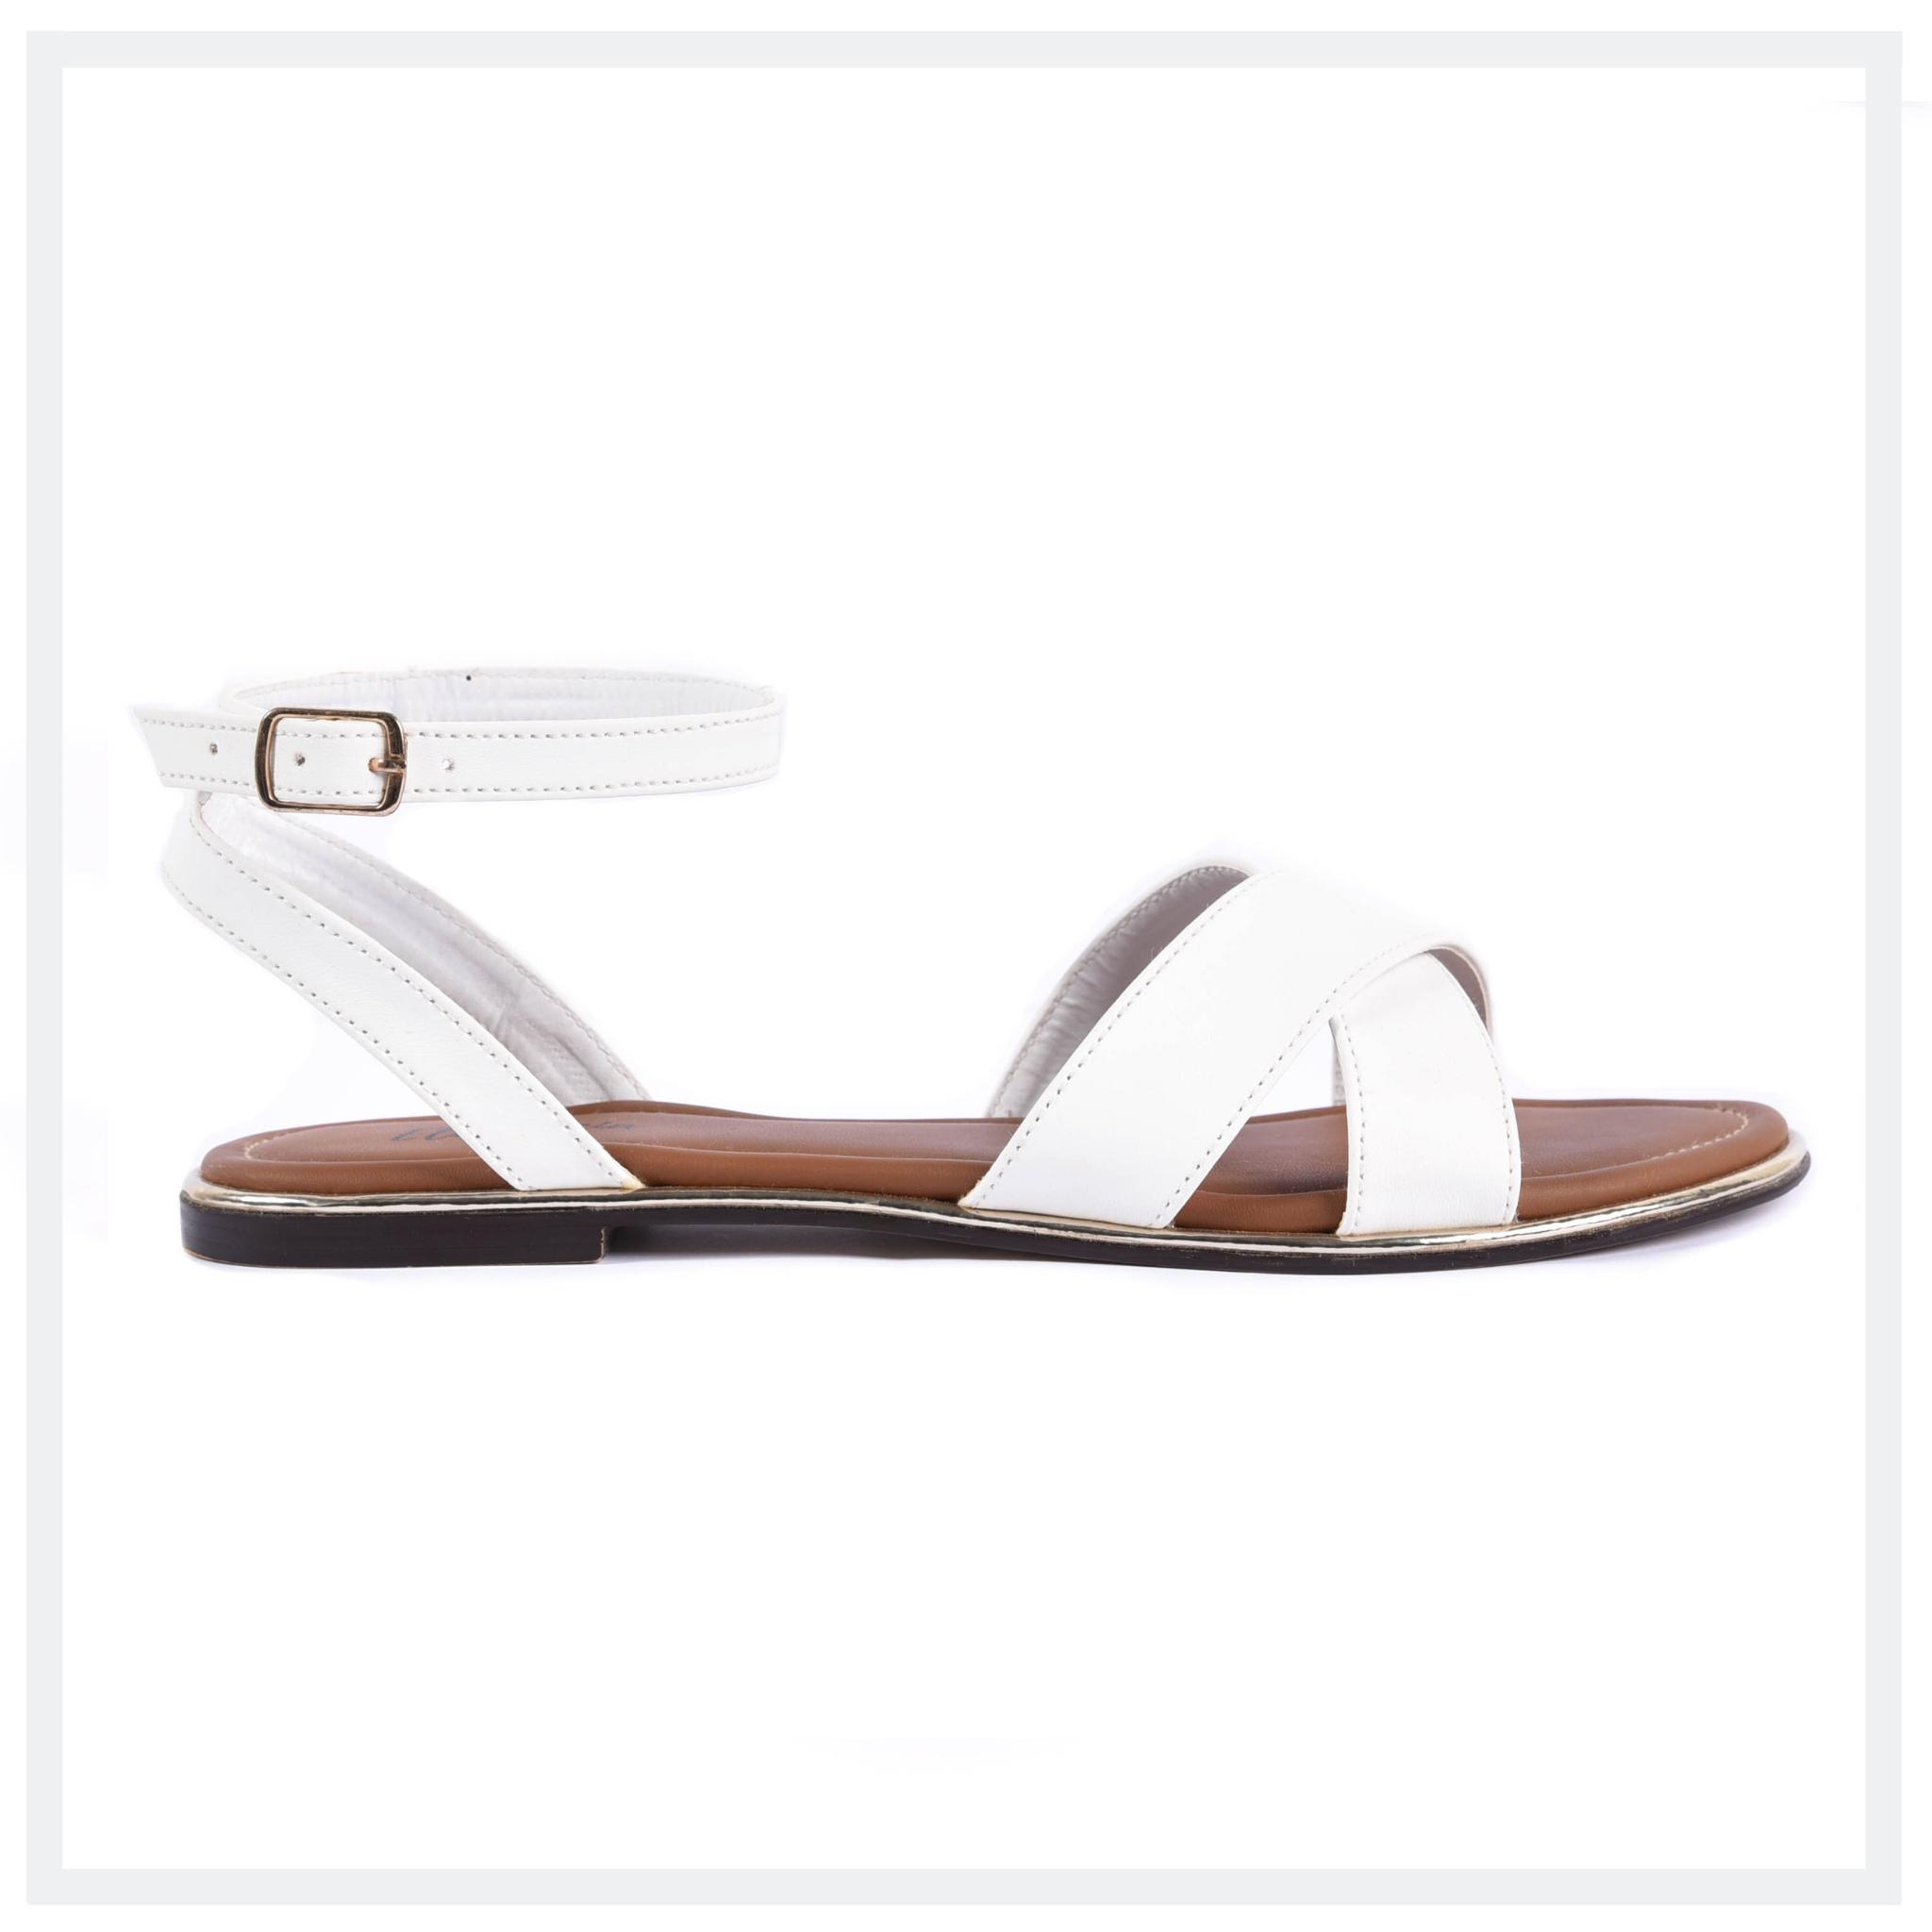 CAMILA  Women's Flat Sandals  White  Elegancia